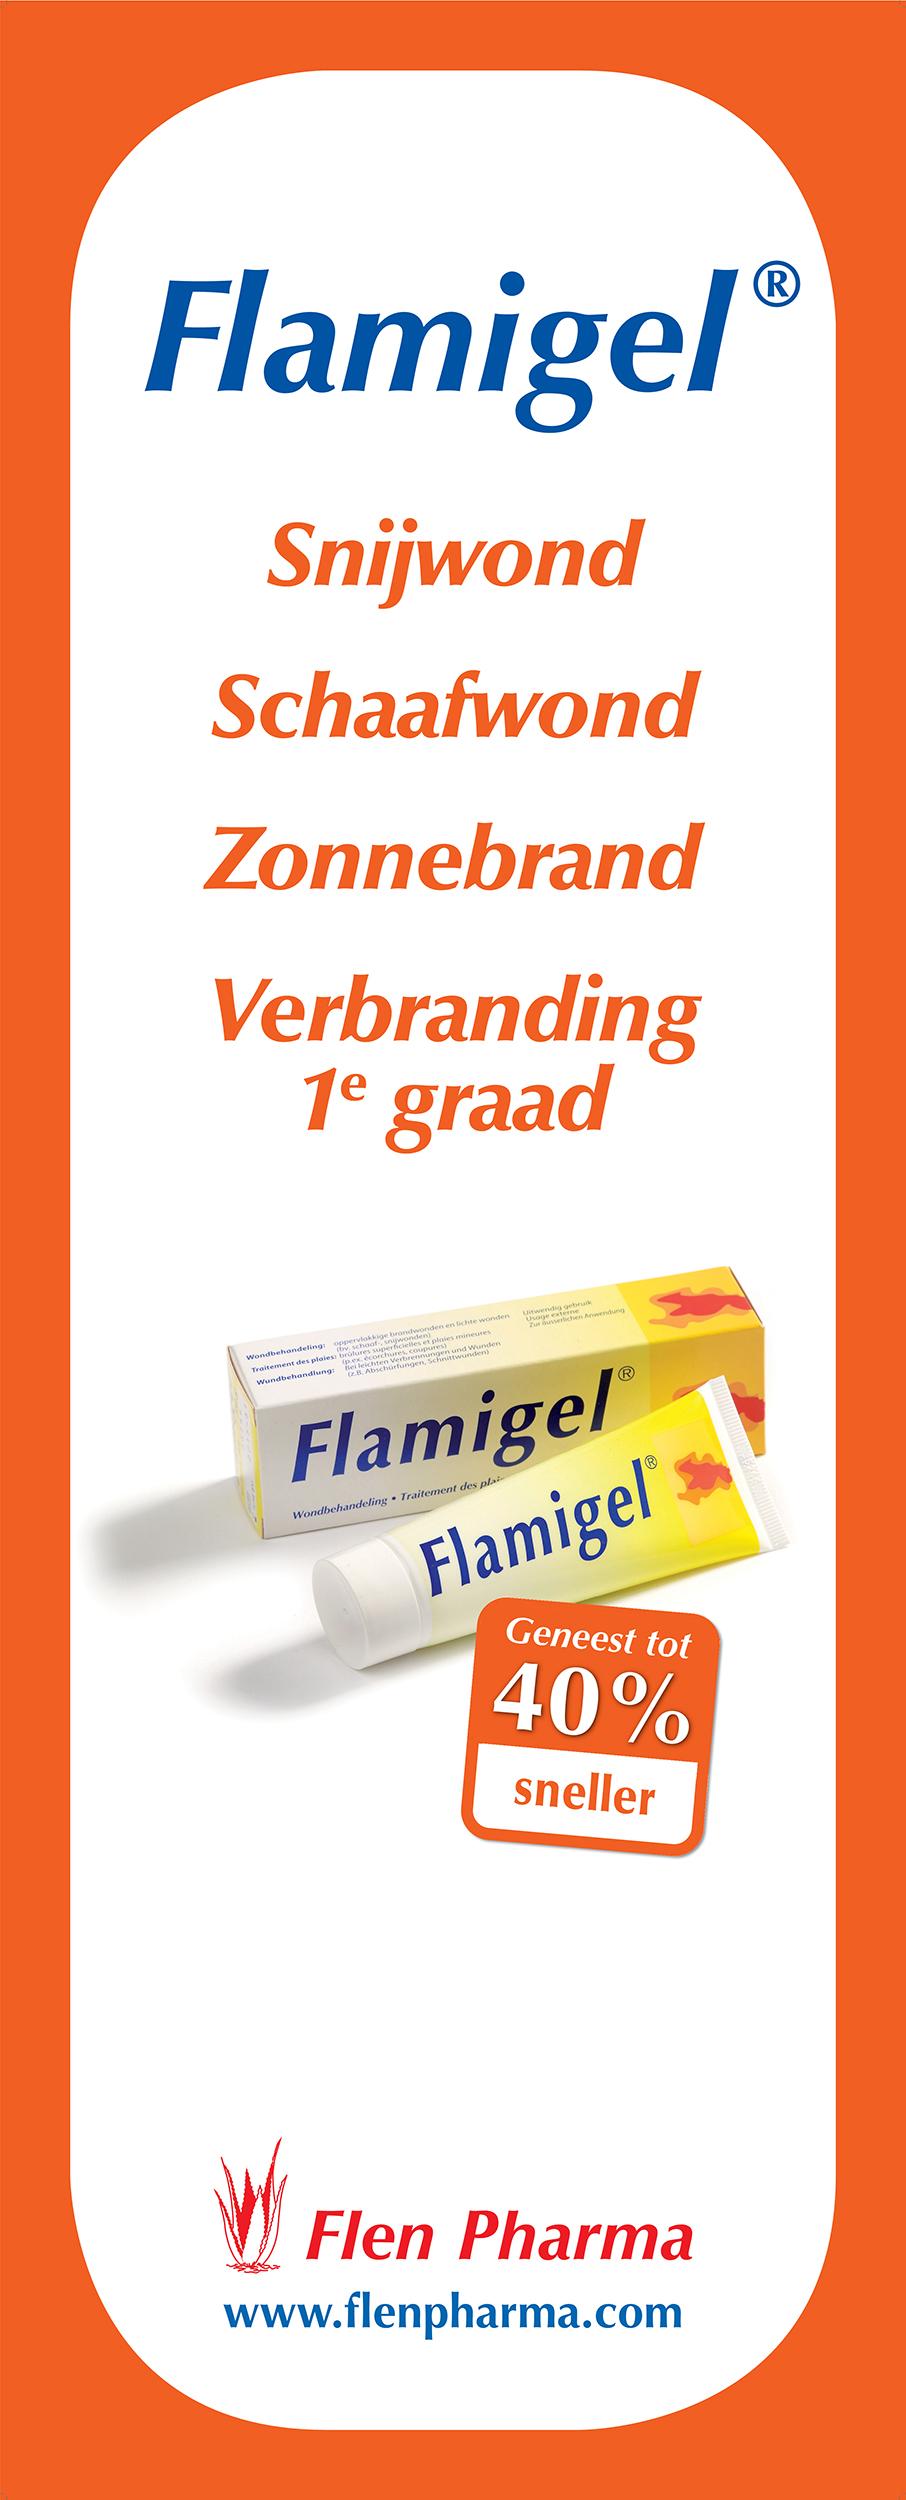 Flen Pharma Flamigel